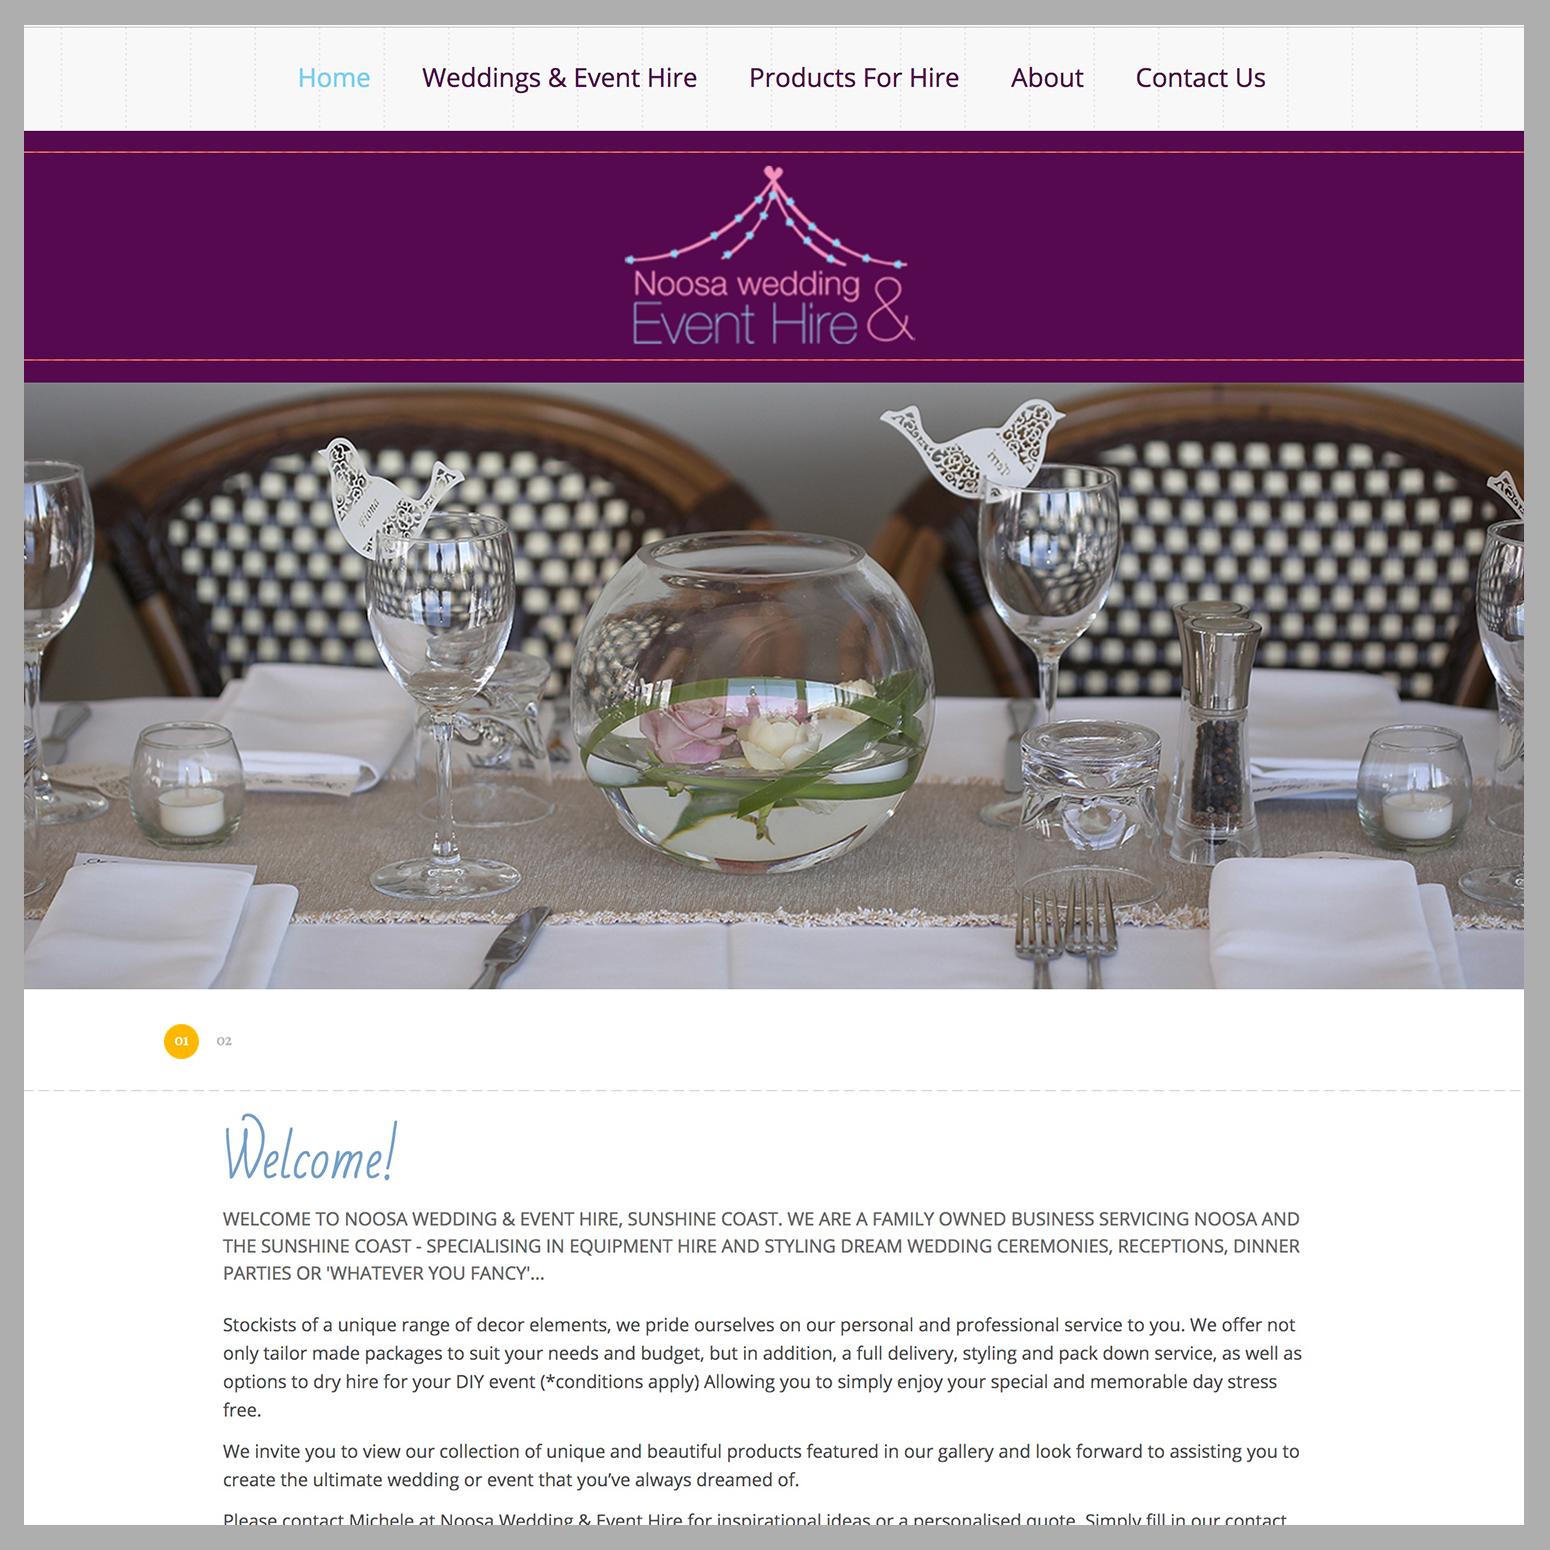 Noosa Wedding & Event Hire